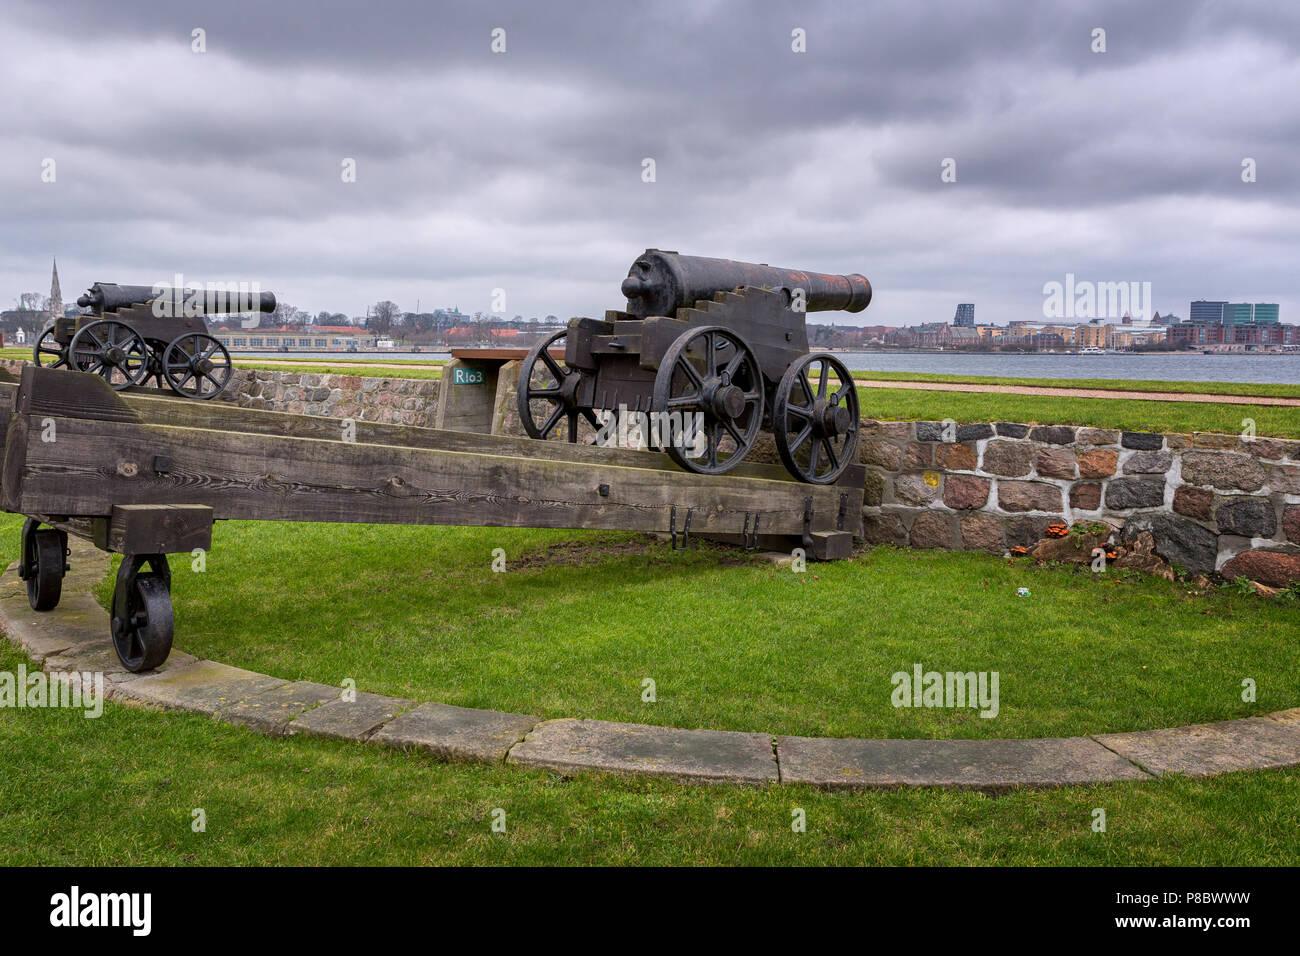 Old canons at Holmen Naval Base, Nyholm, Copenhagen, Denmark - Stock Image